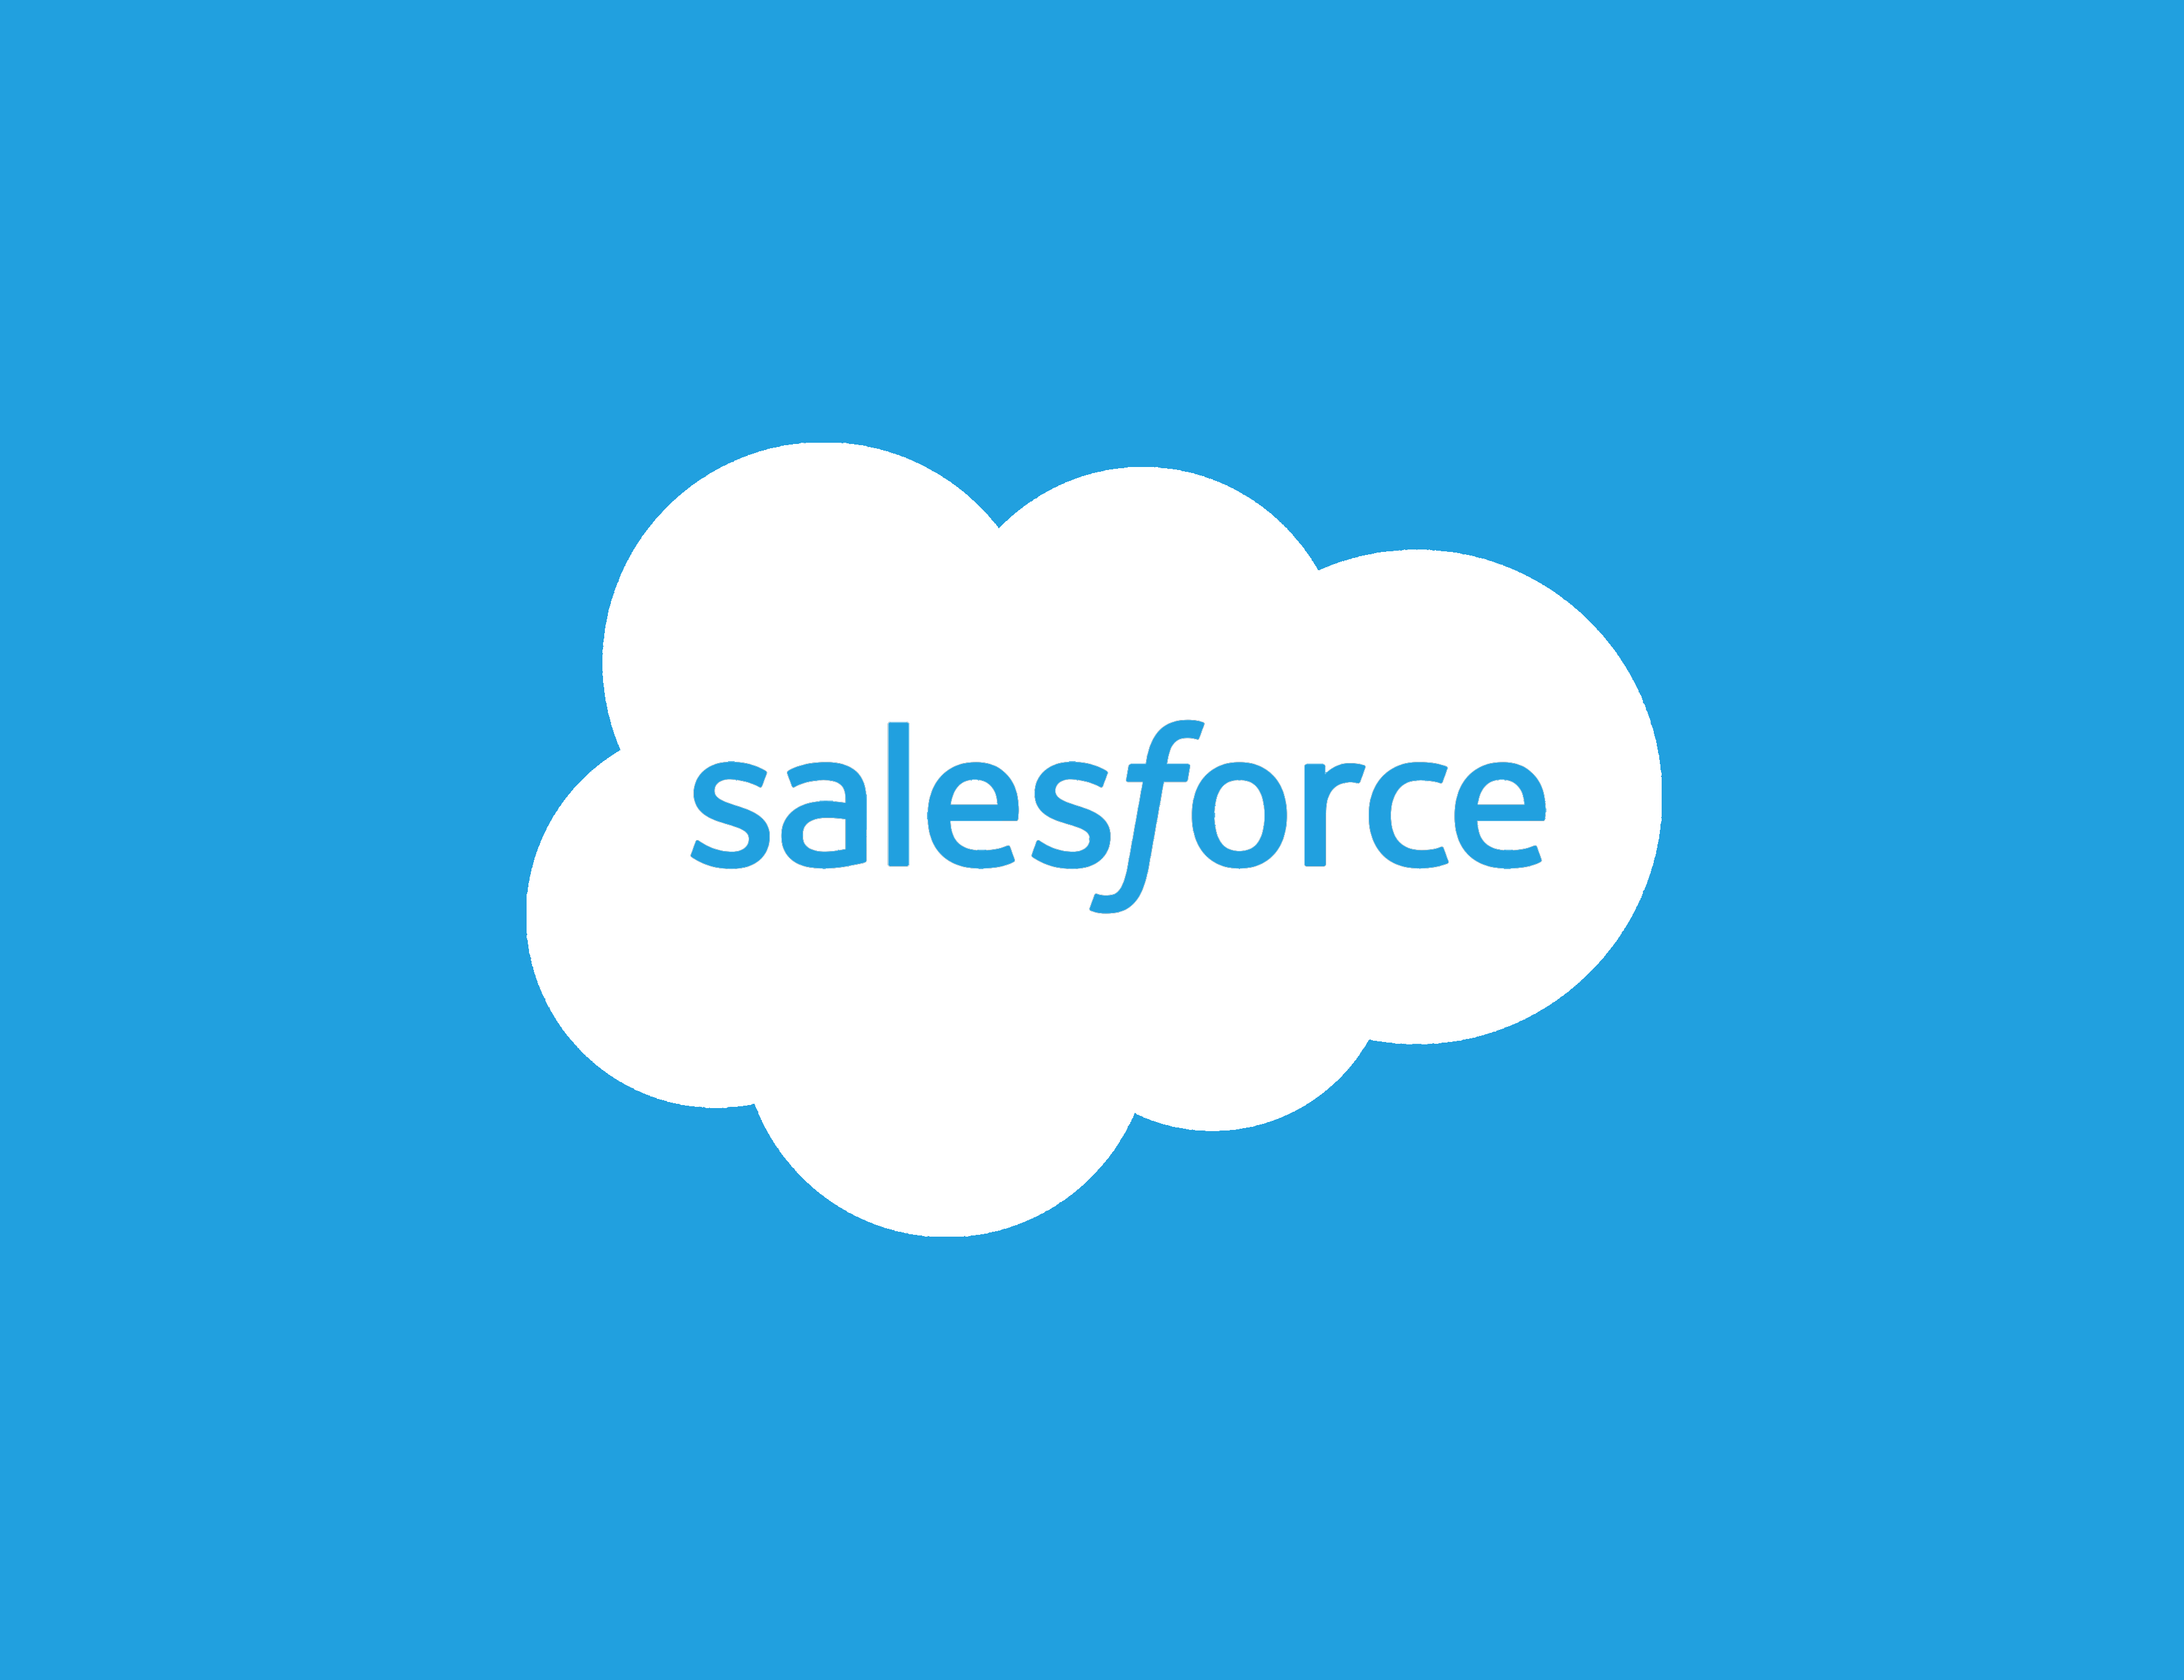 salesforce logo, a cloud on background of blue